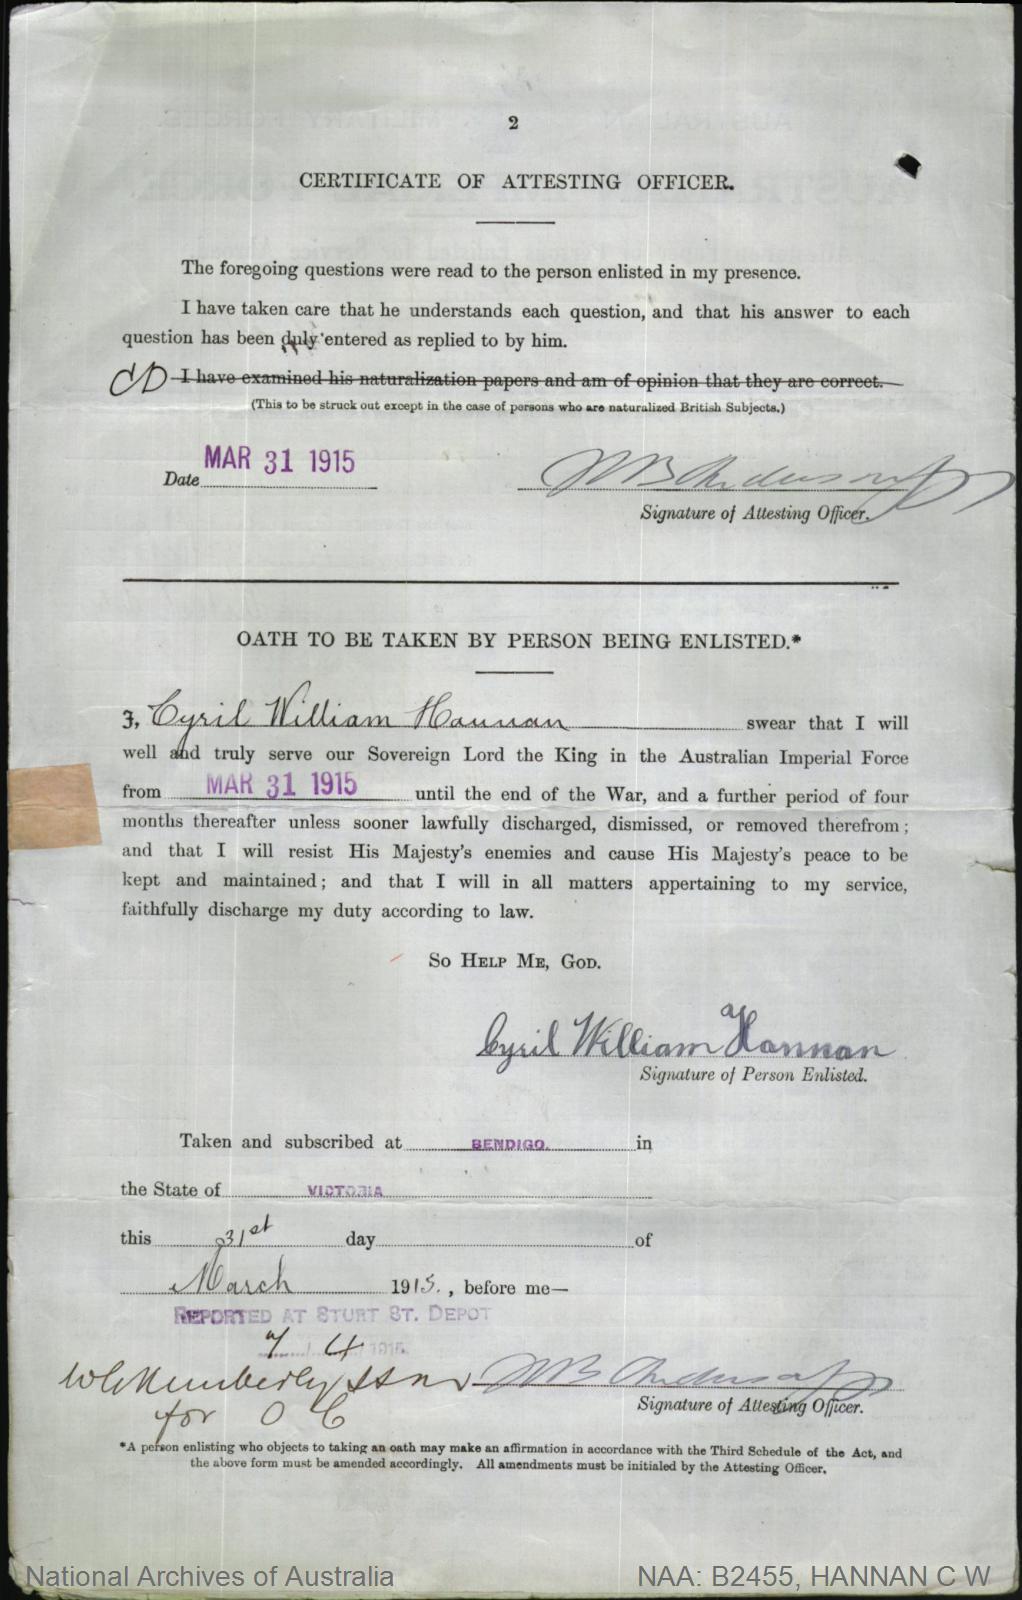 HANNAN Cyril William : Service Number - 397 : Place of Birth - Bendigo VIC : Place of Enlistment - Bendigo VIC : Next of Kin - (Wife) HANNAN Vera